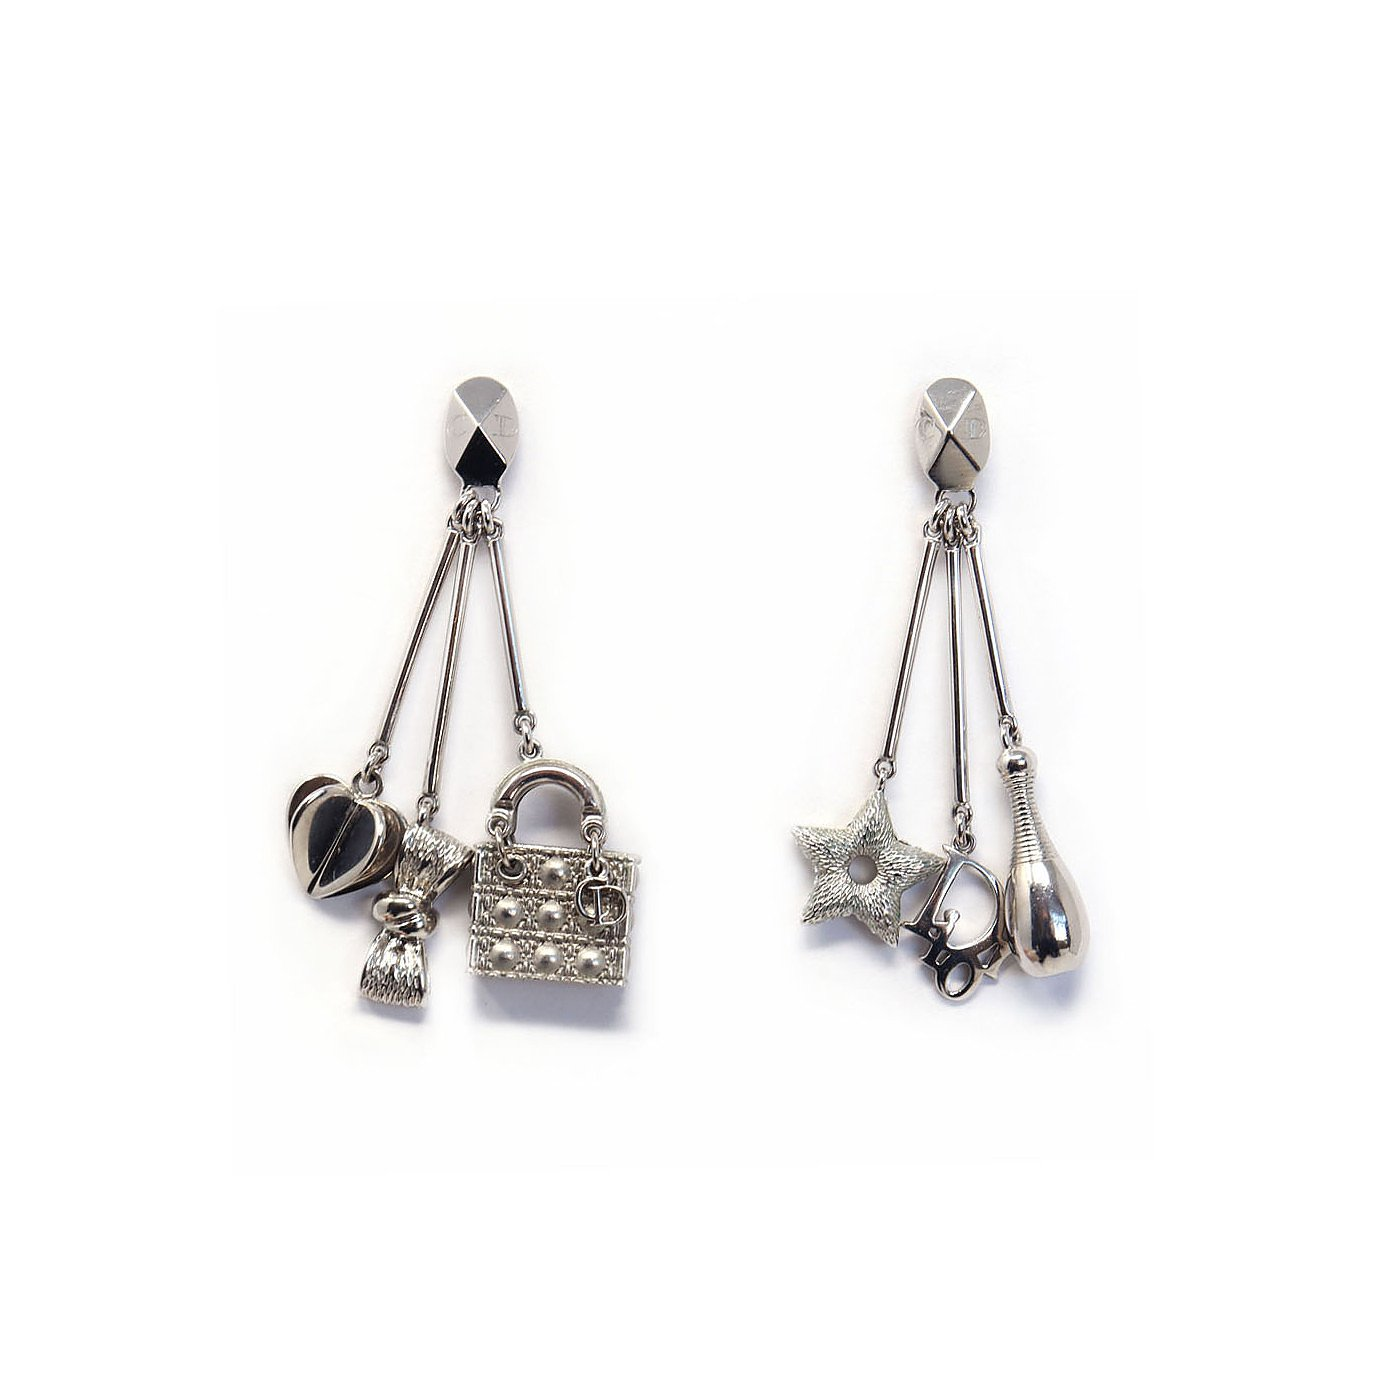 Dior Vintage 1990s Silver Emblem Charm Earrings